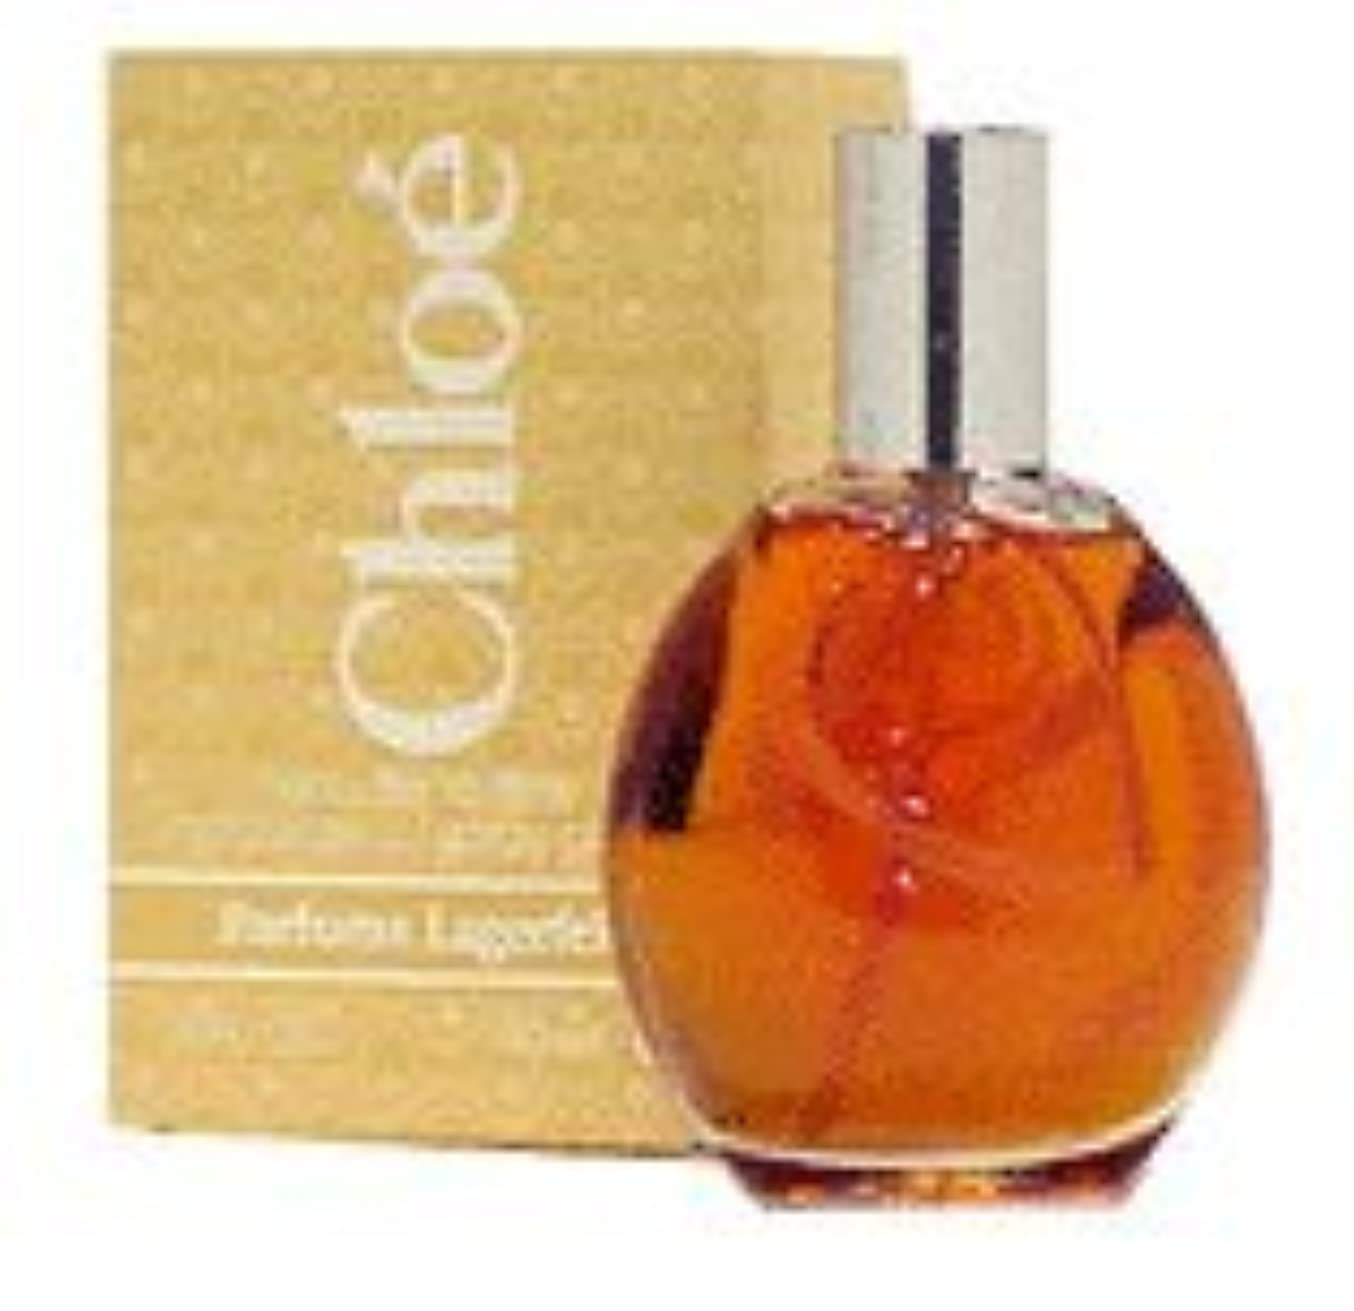 Chloe (クロエ) 3.0 oz (90ml) EDT Spray by Karl Lagerfeld for Women